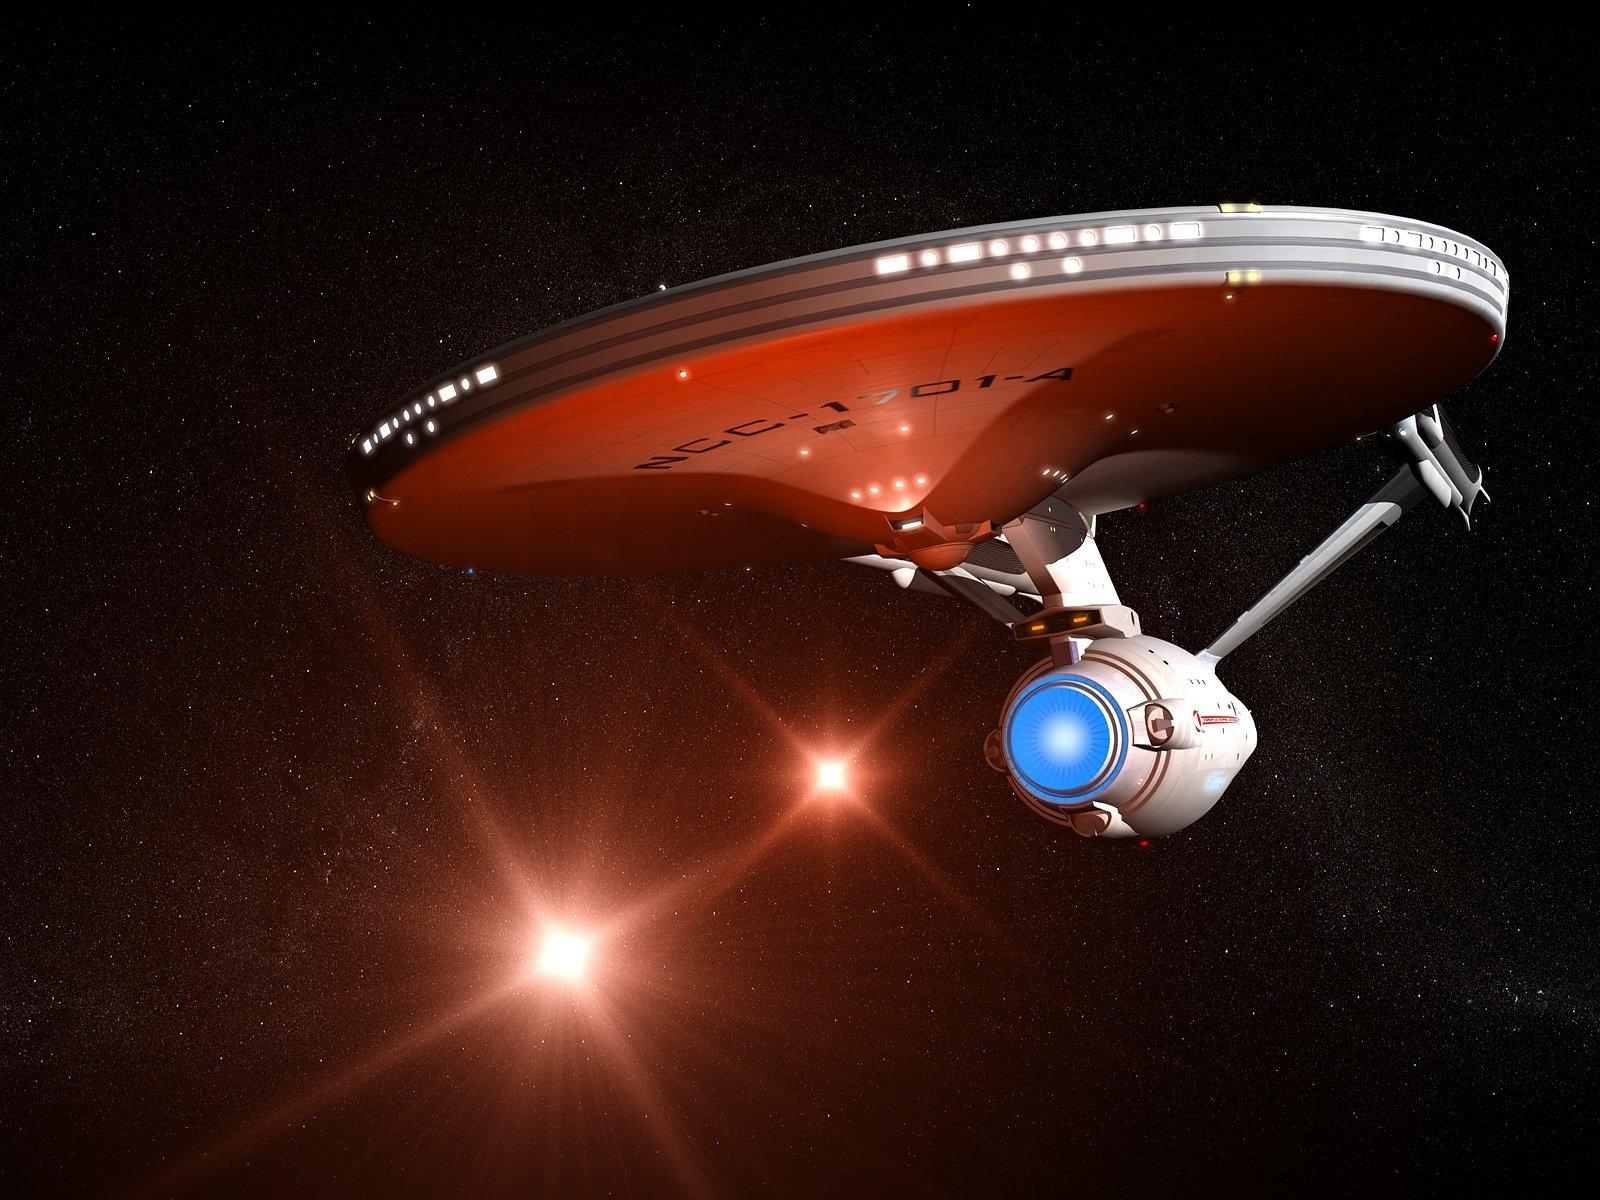 Uss Enterprise Raumschiff